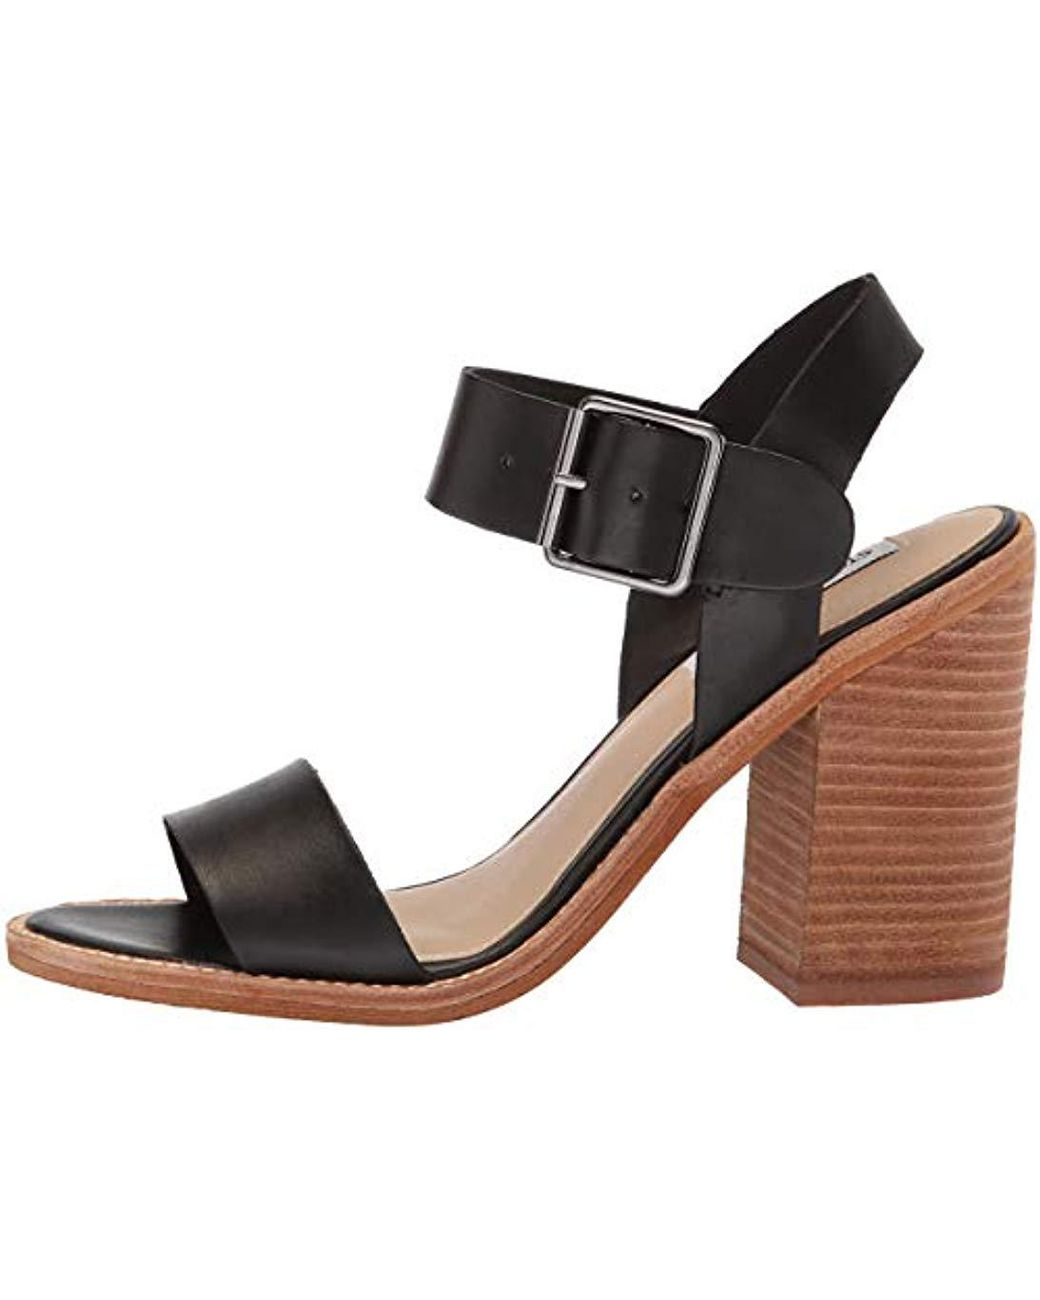 9c19c610521 Lyst - Steve Madden Castro Heeled Sandal in Black - Save 55%